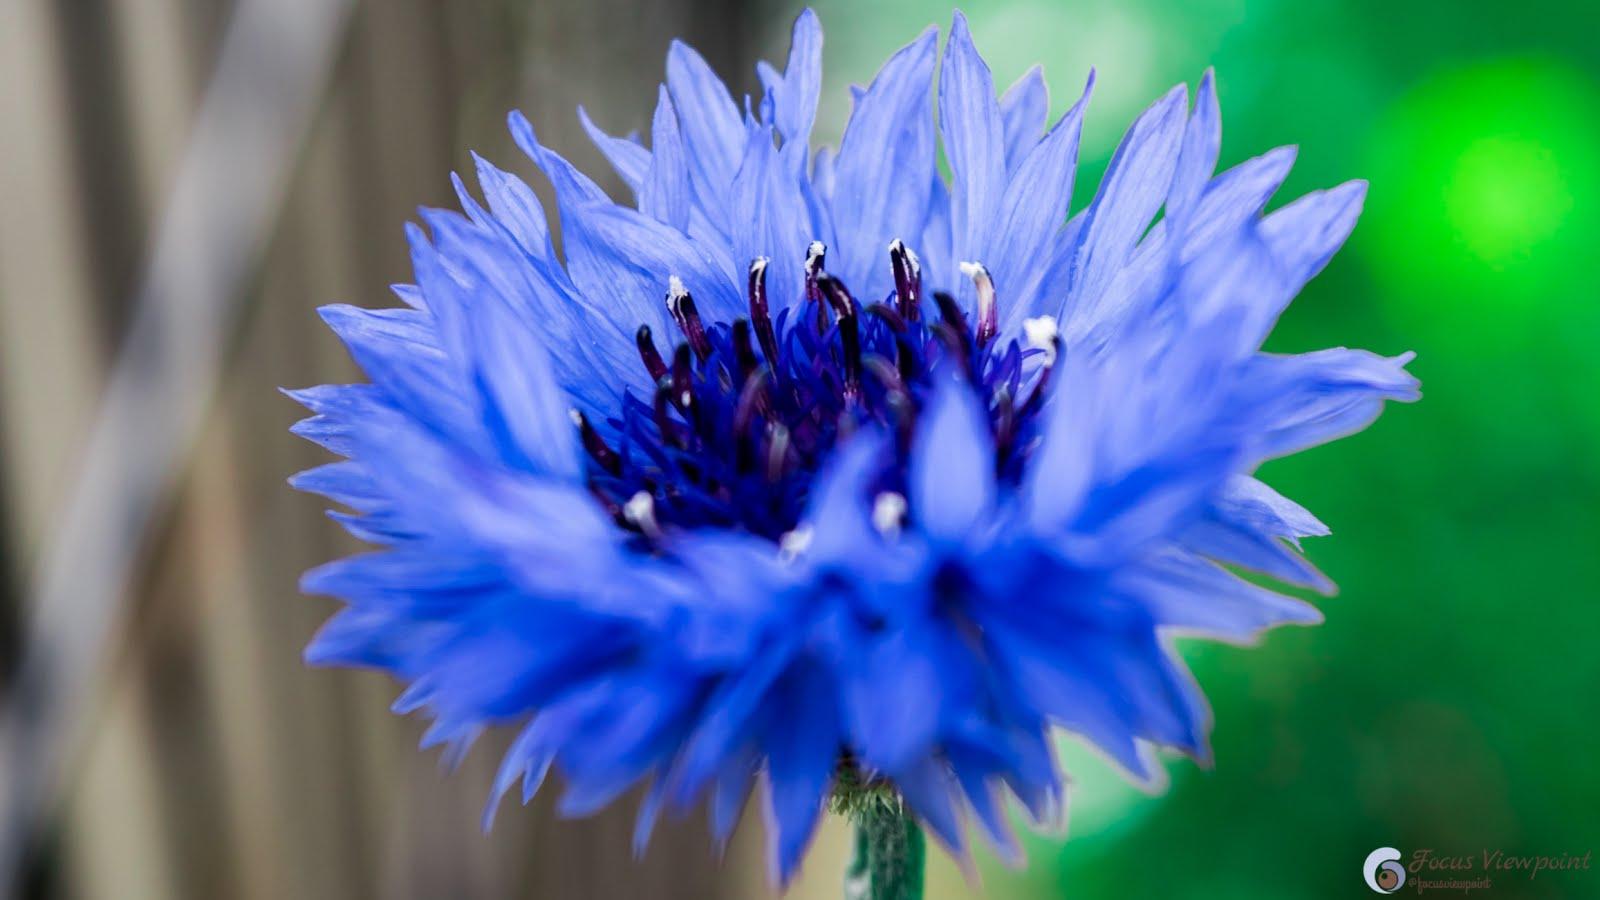 Centaurea cyanus - aka cornflower or bachelor's button -  blue flower closeup shot